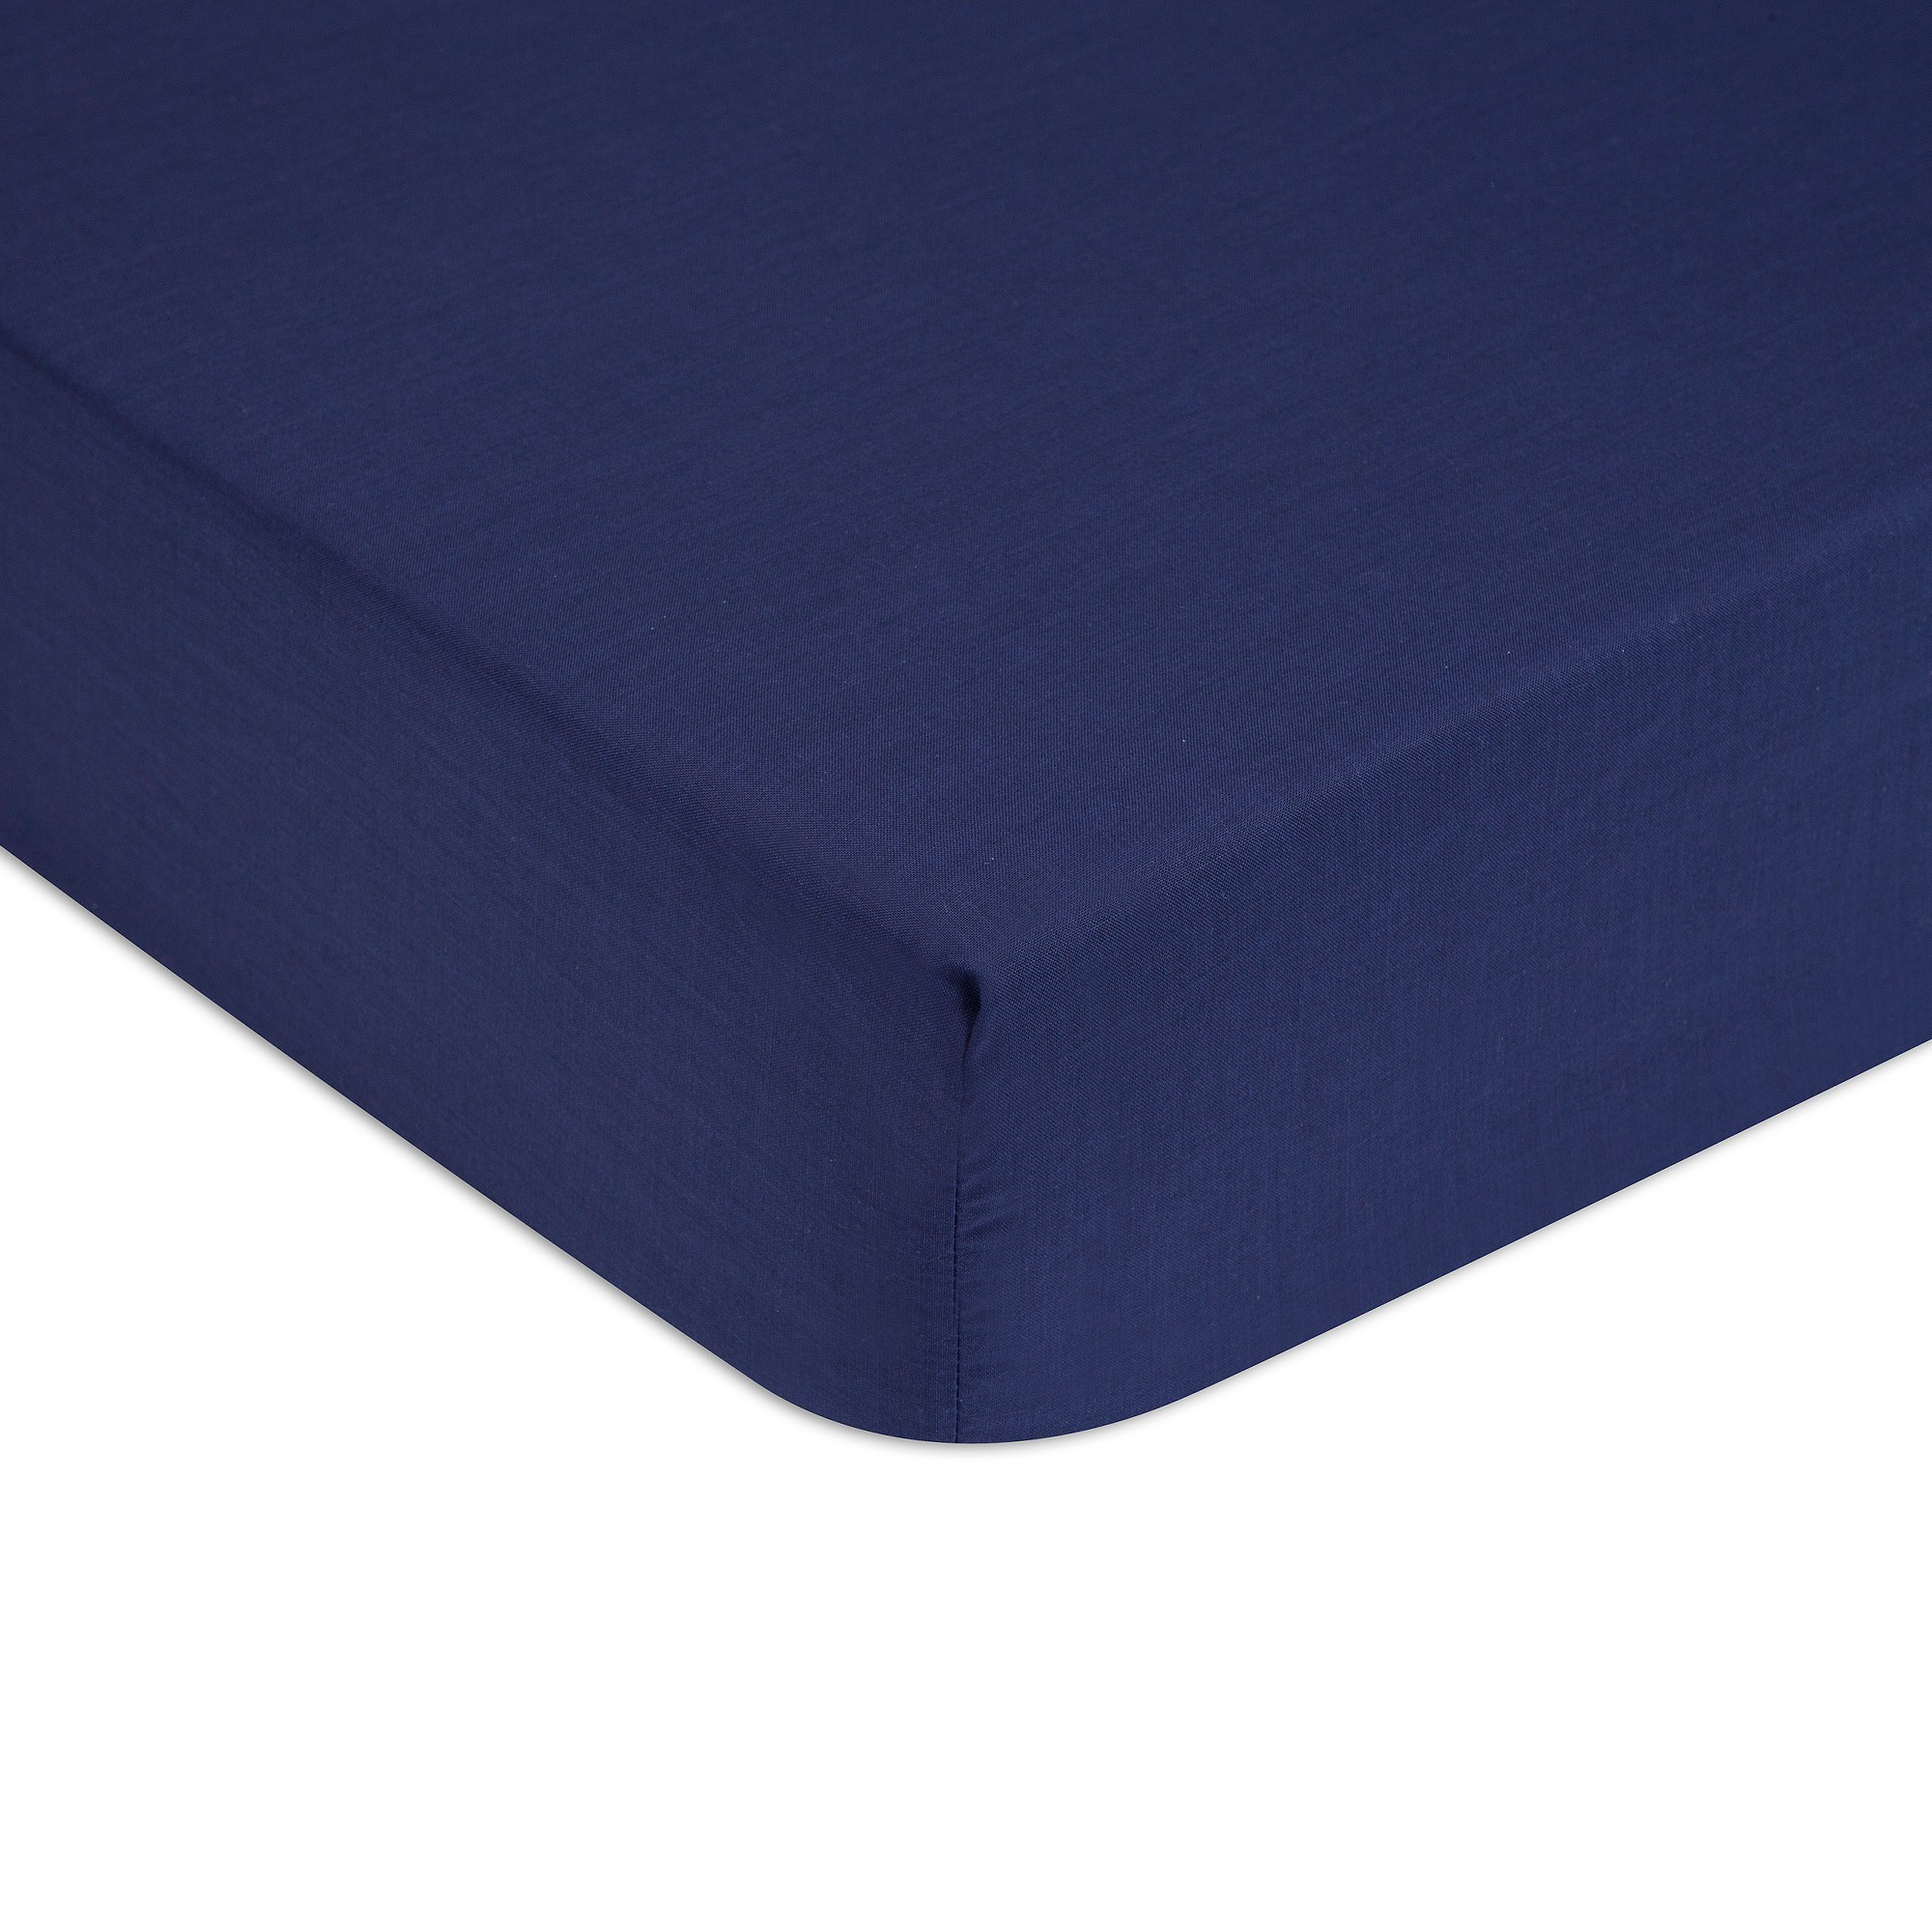 Cearceaf de pat cu elastic Tommy Hilfiger Unis Percale 160x200cm Albastru Navy poza